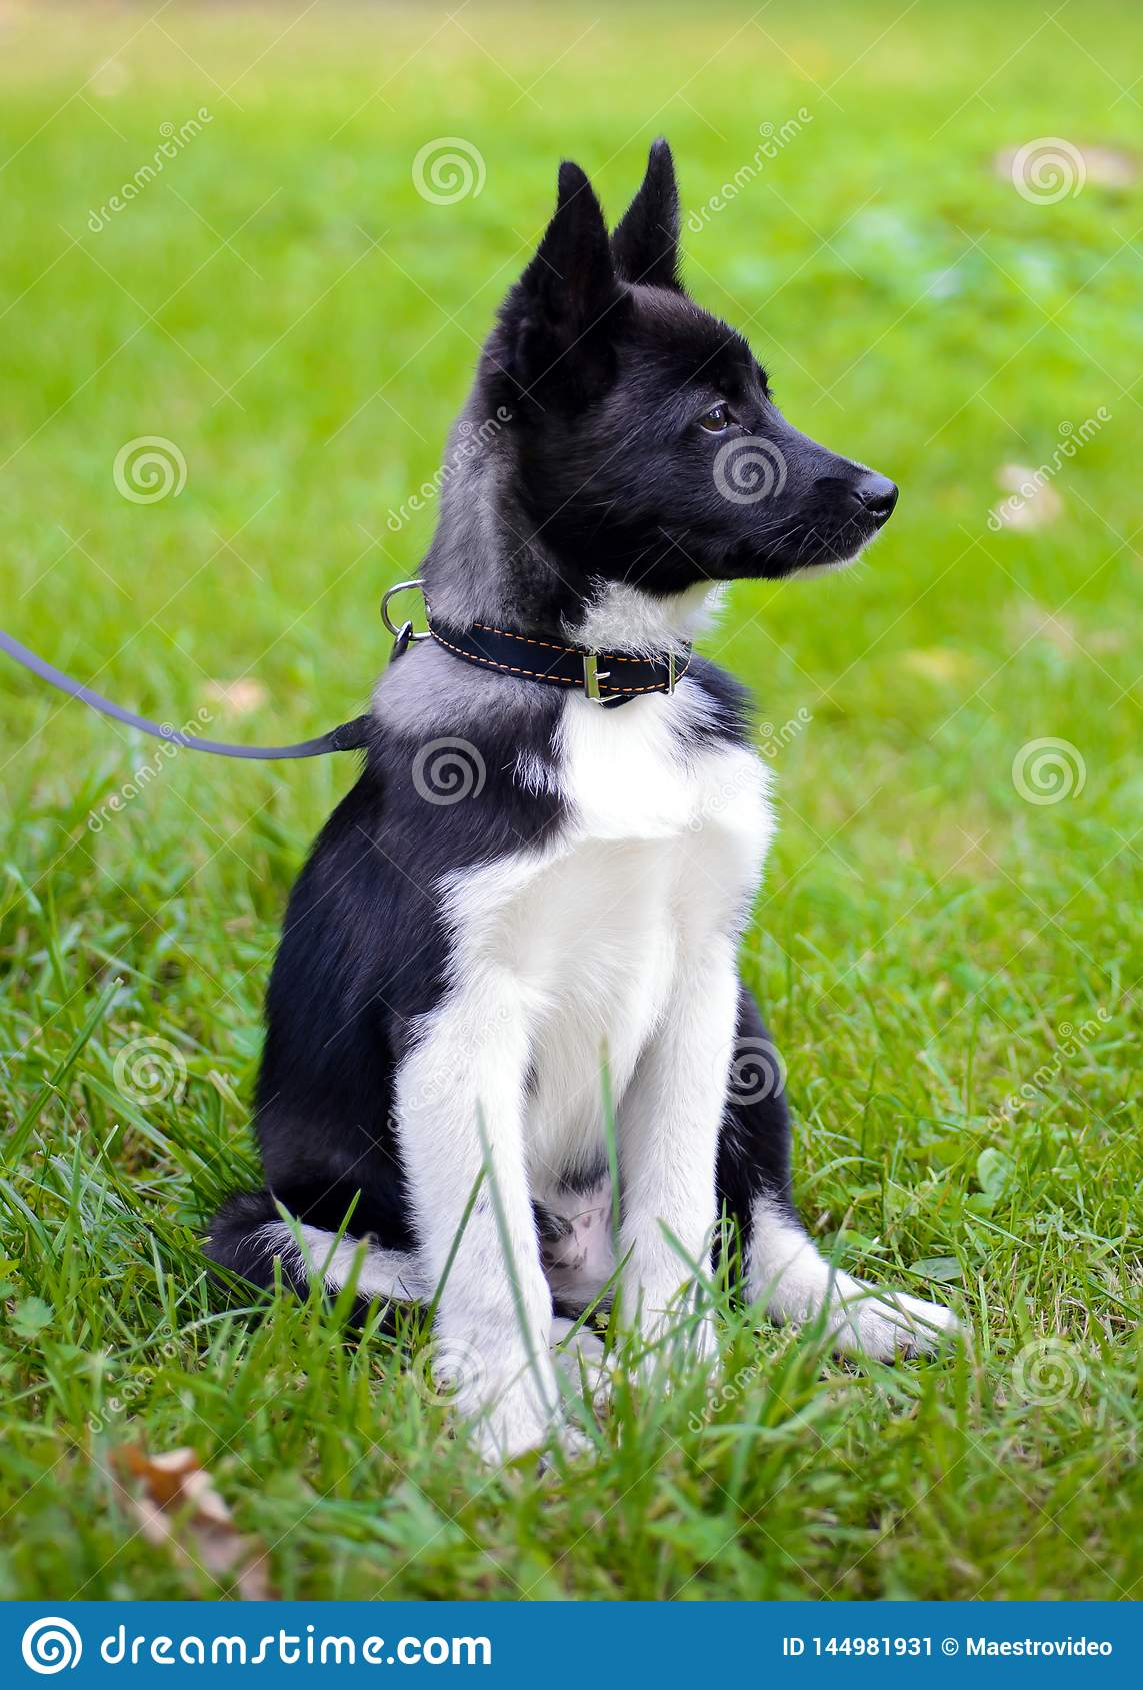 Щенок Laika на траве